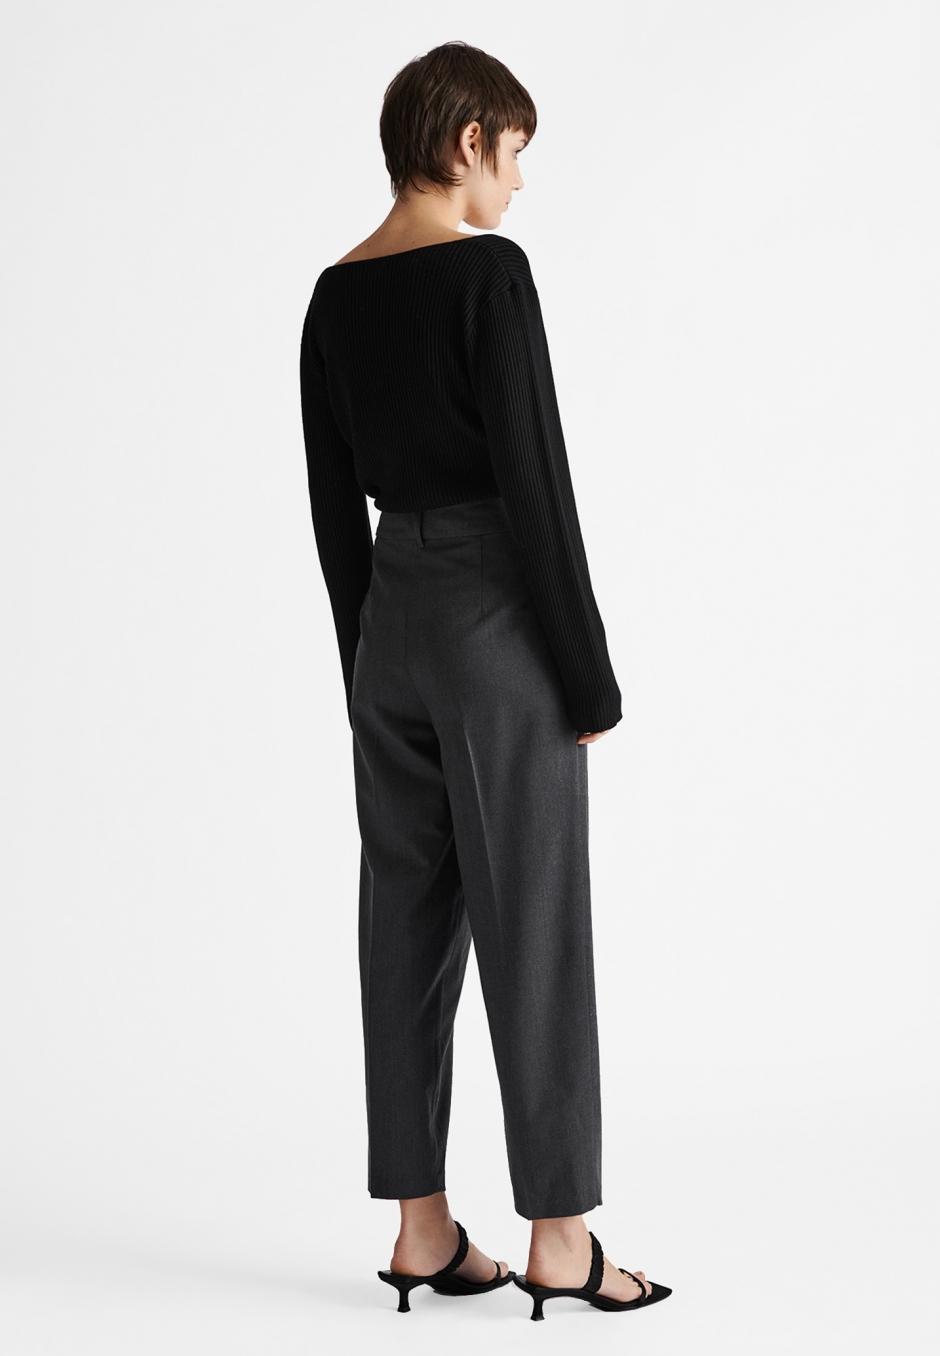 Stylein Berga Trousers